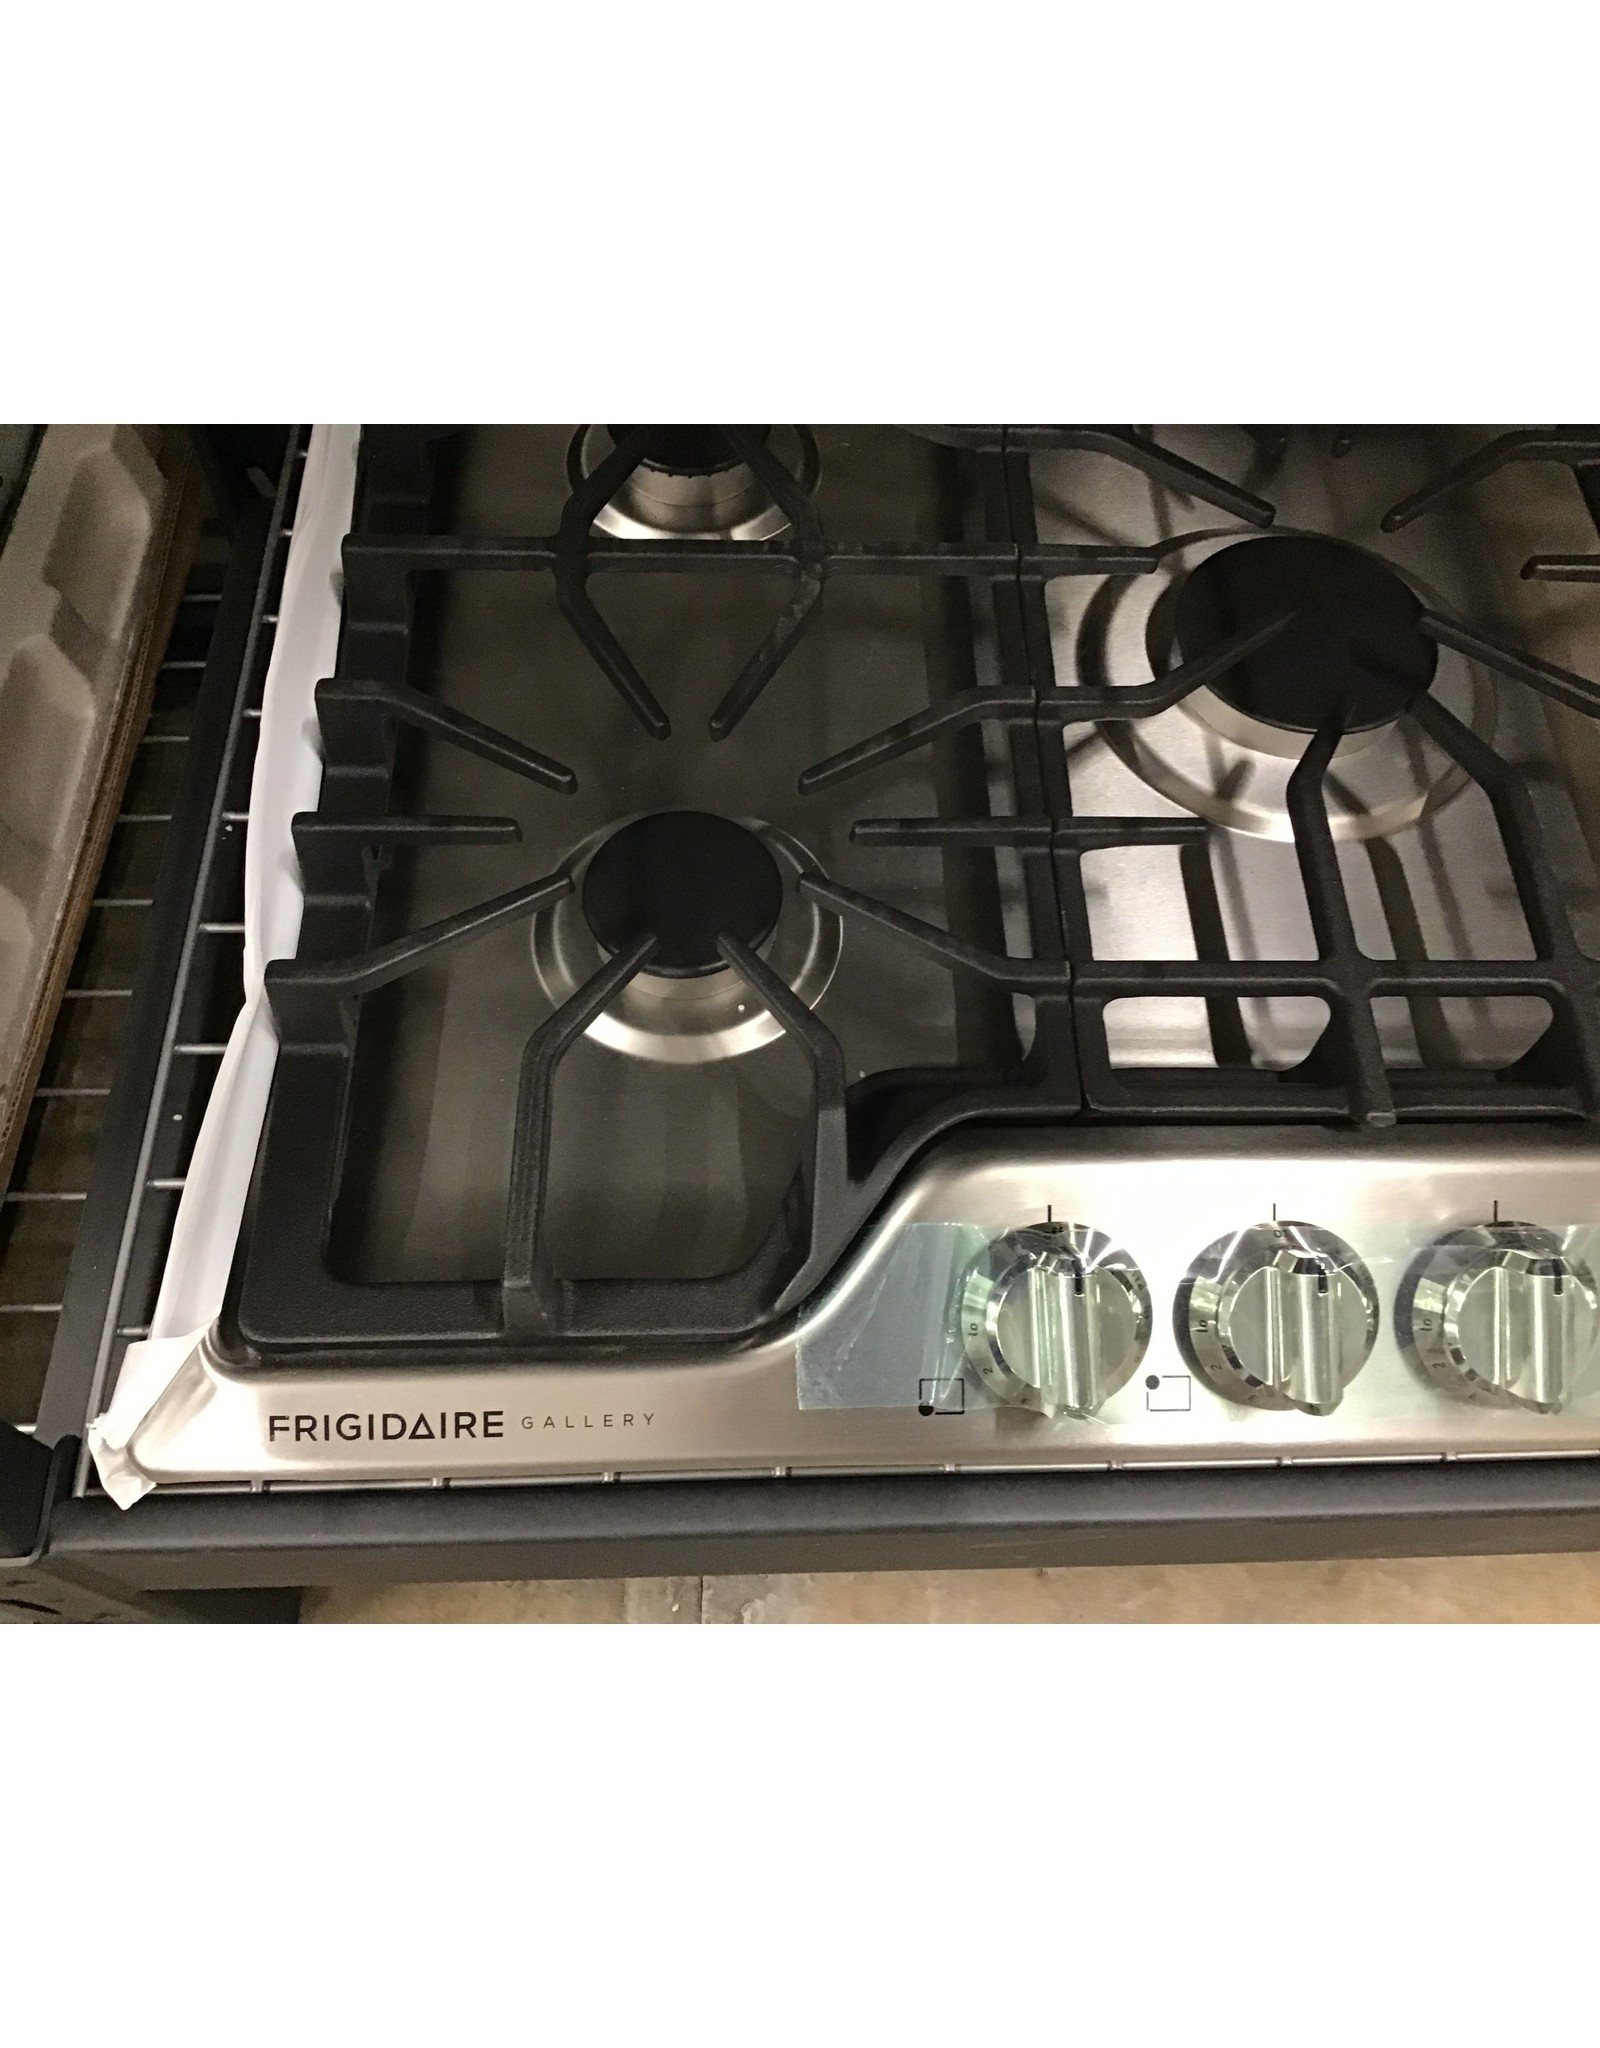 "Frigidaire Frigidaire 30"" Built-In Gas Cooktop"